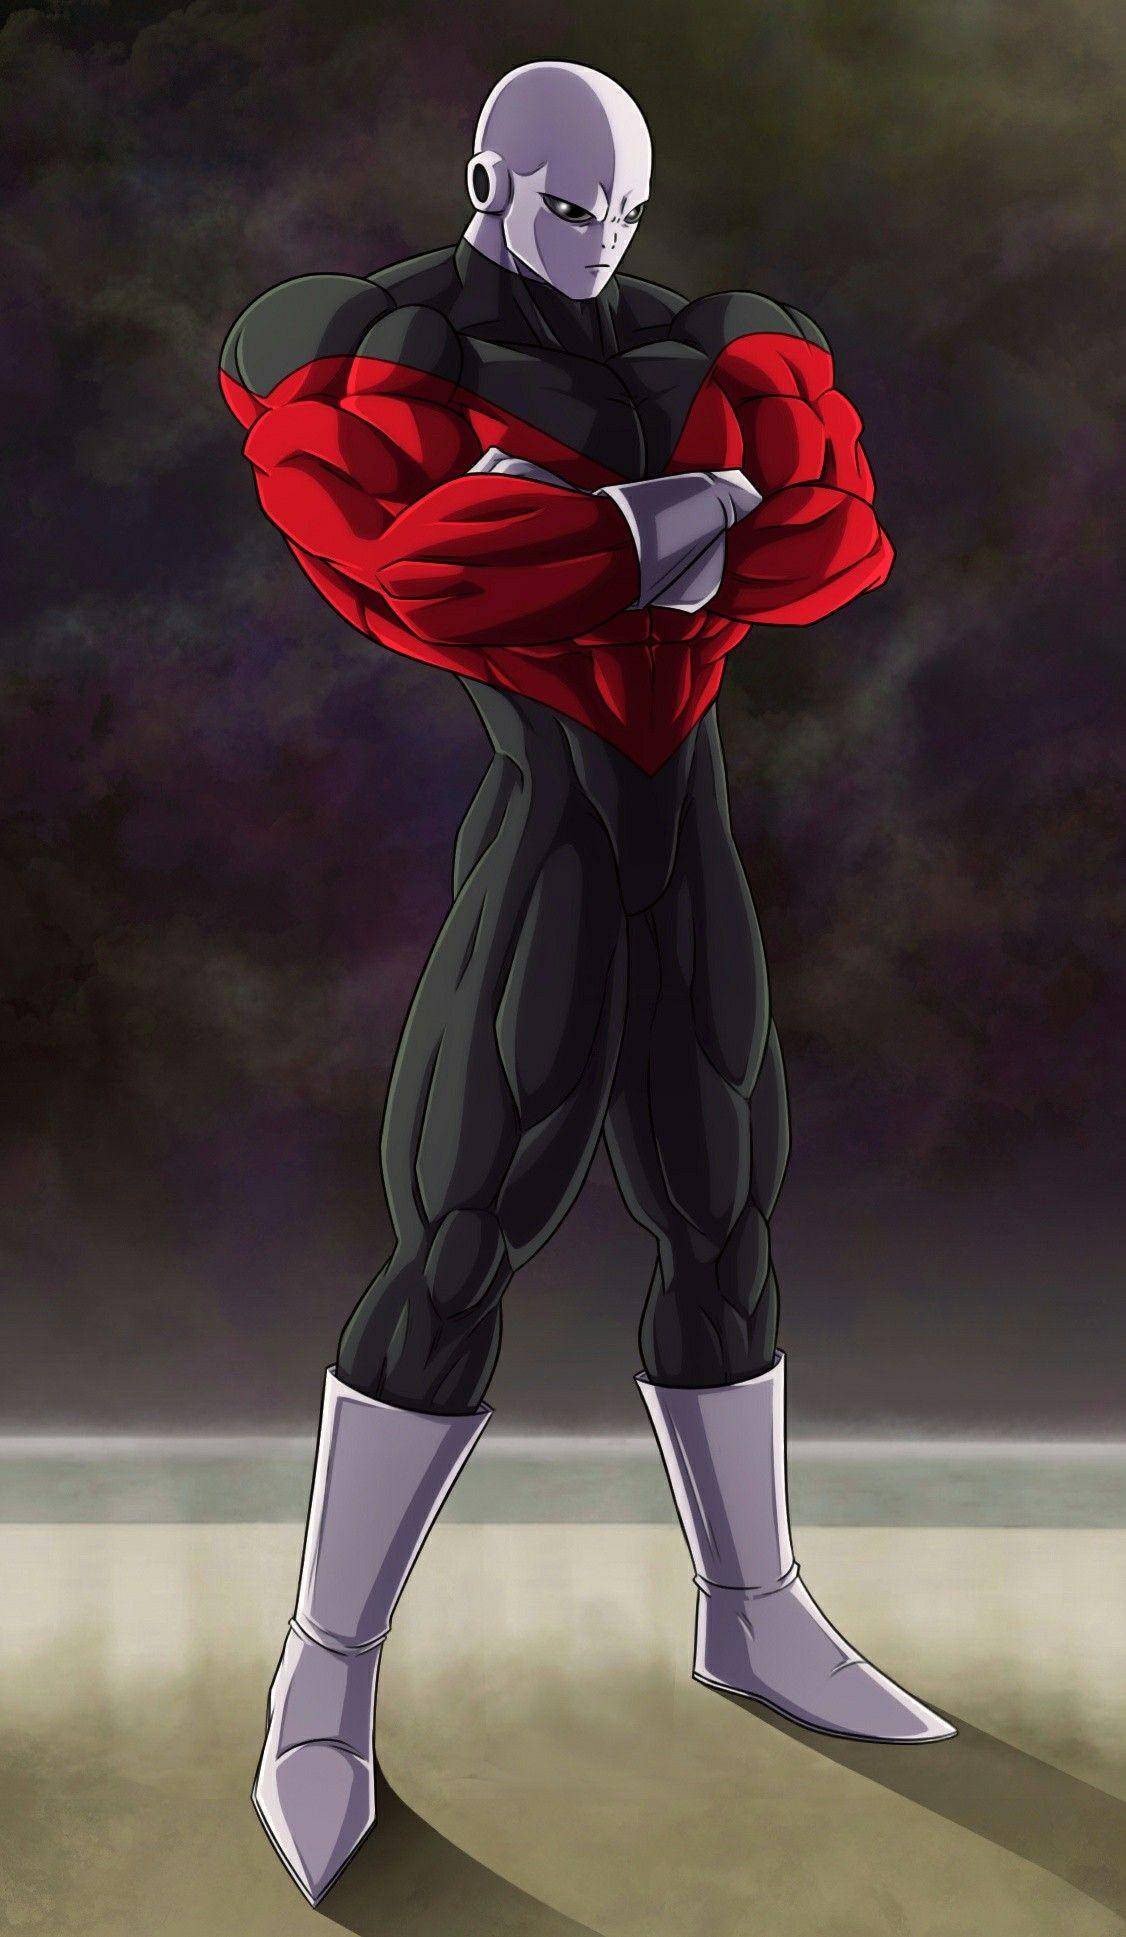 Jiren Universo 11 Anime Dragon Ball Super Dragon Ball Art Jiren The Gray